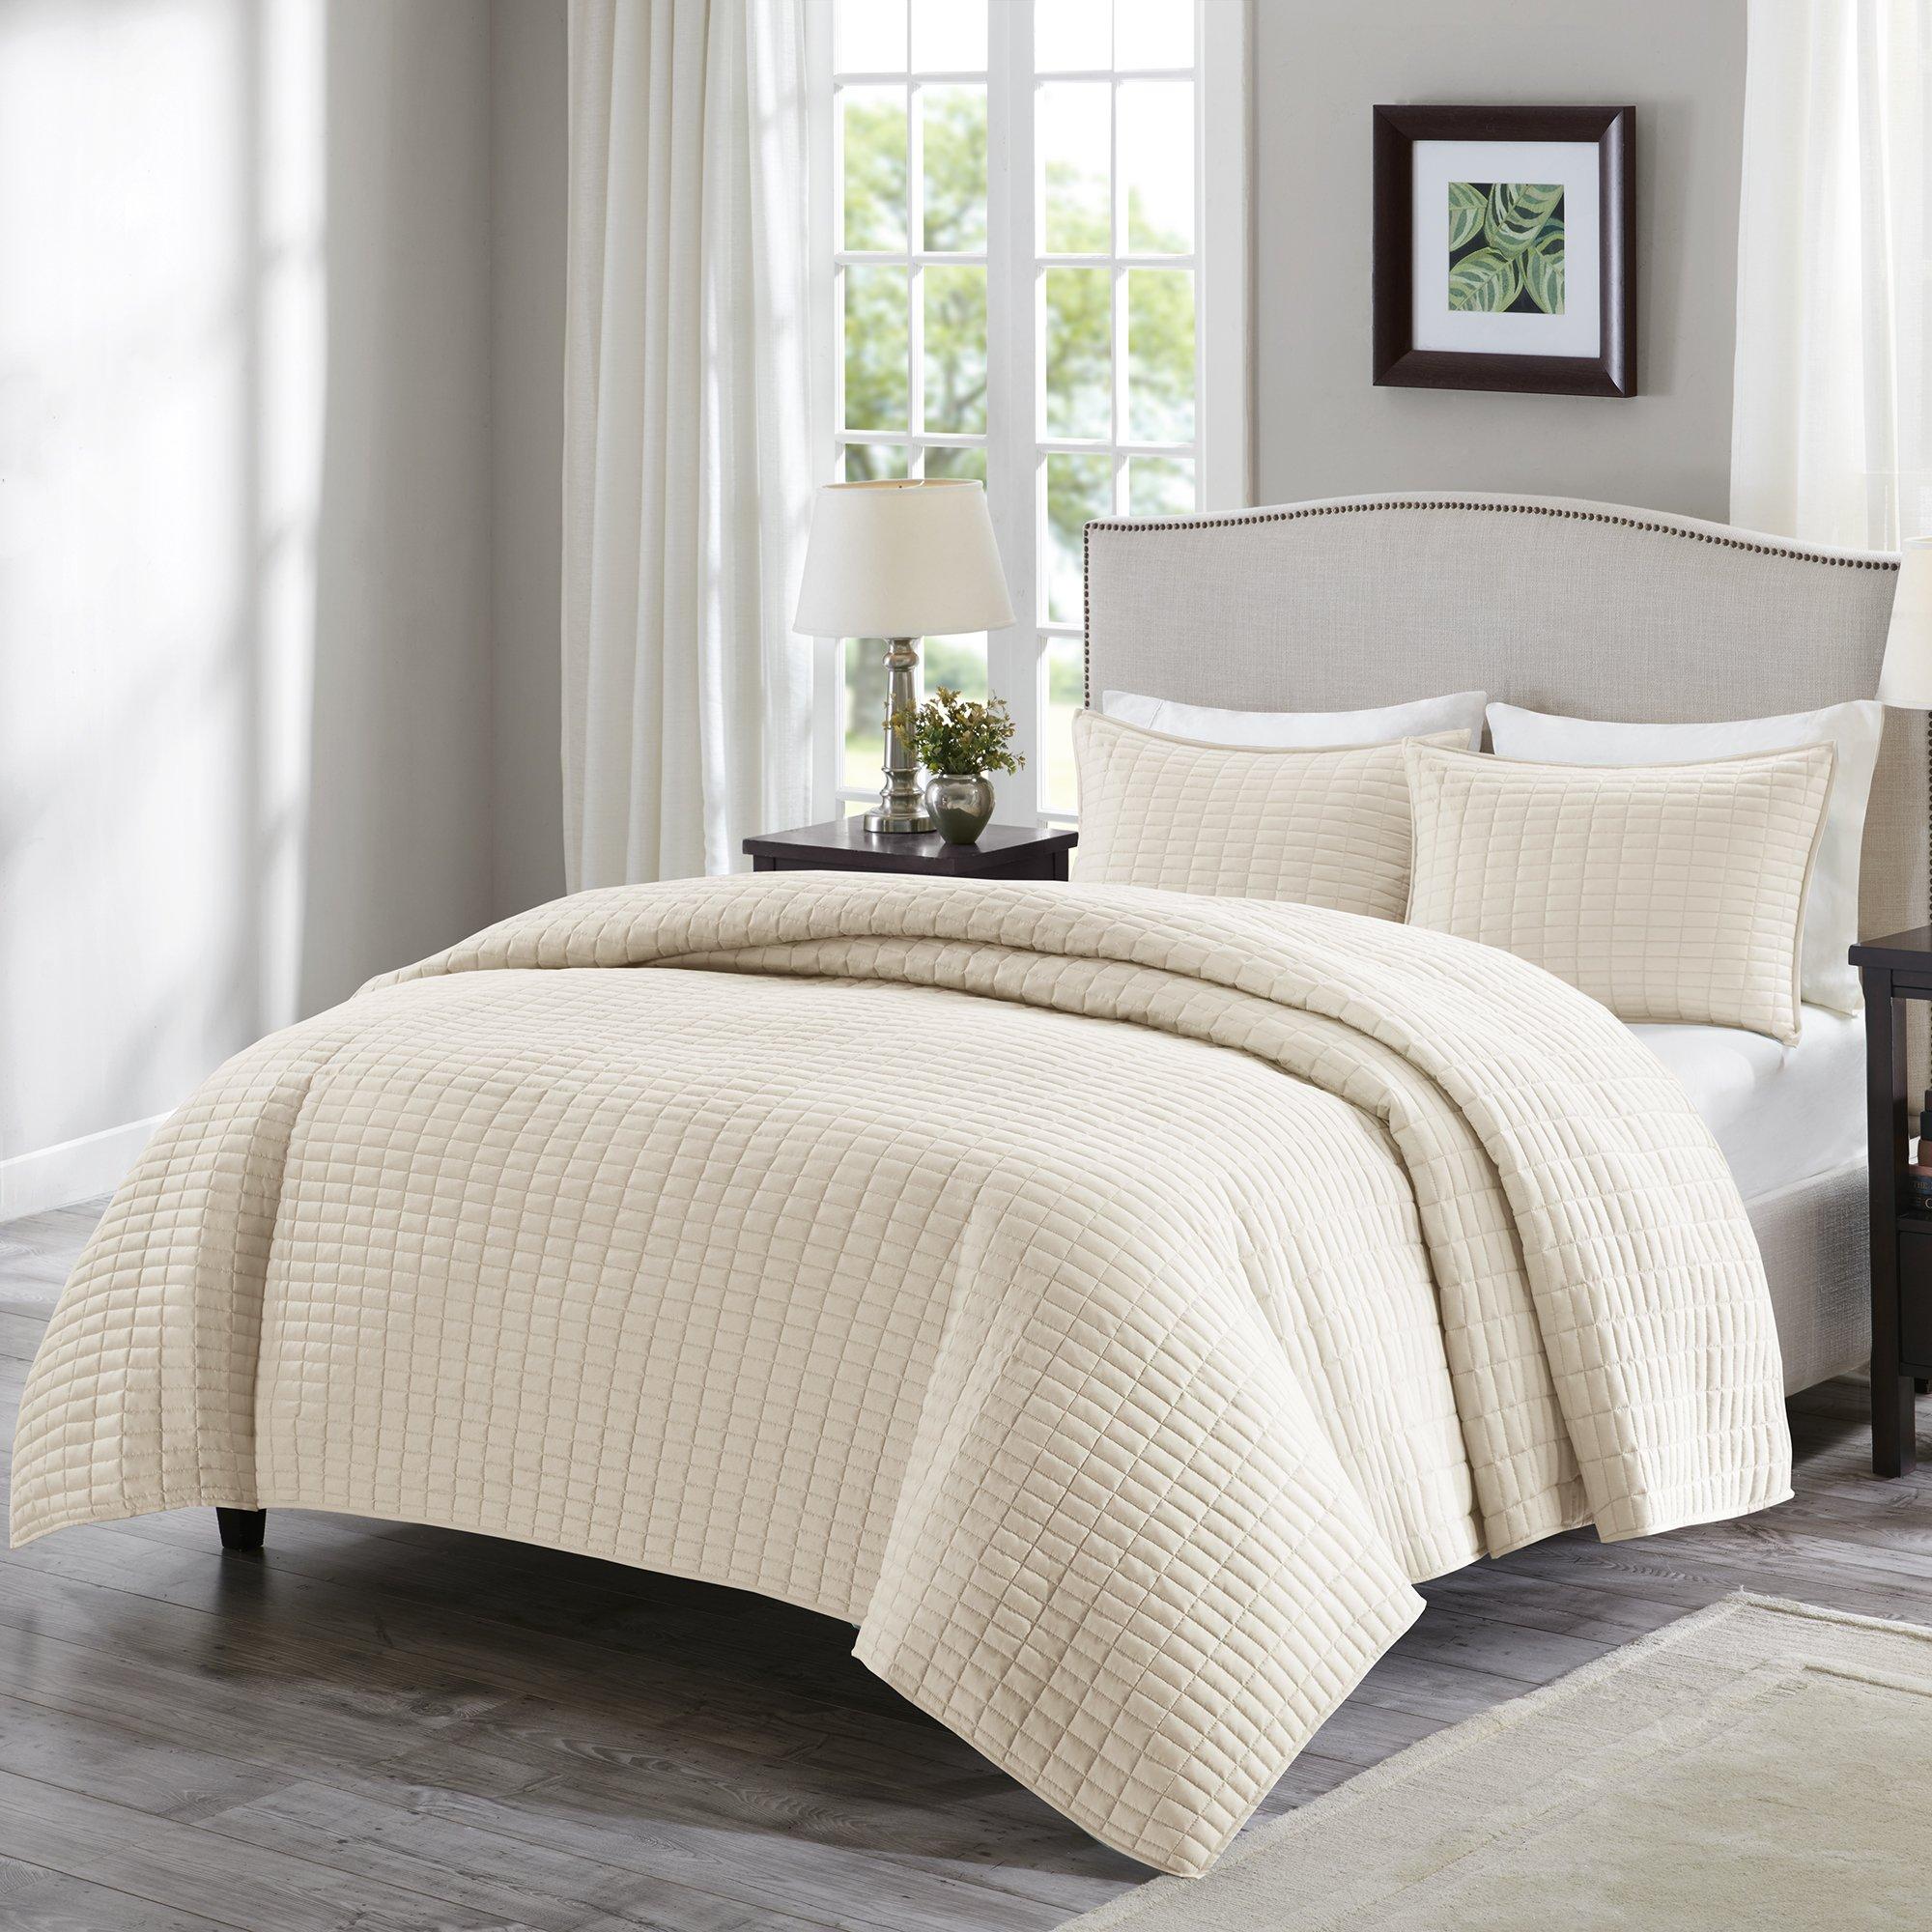 Comfort Spaces - Kienna Quilt Mini Set - 3 Piece - Ivory - Stitched Quilt Pattern - King size, includes 1 Quilt, 2 Shams